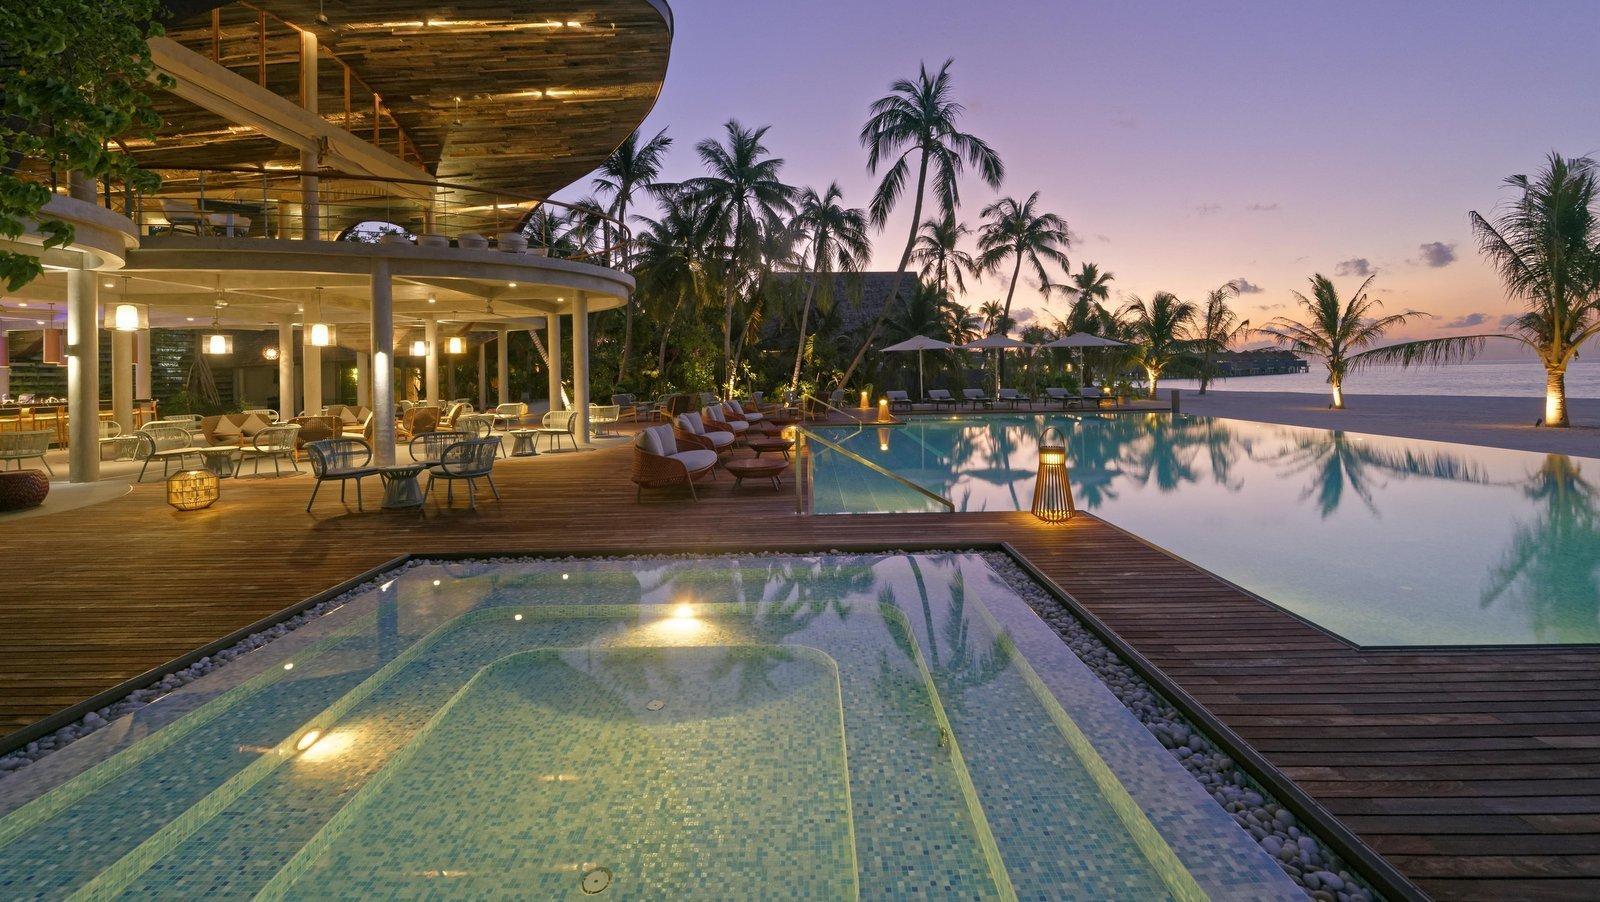 Мальдивы, отель LTI Maafushivaru Maldives, бассейн